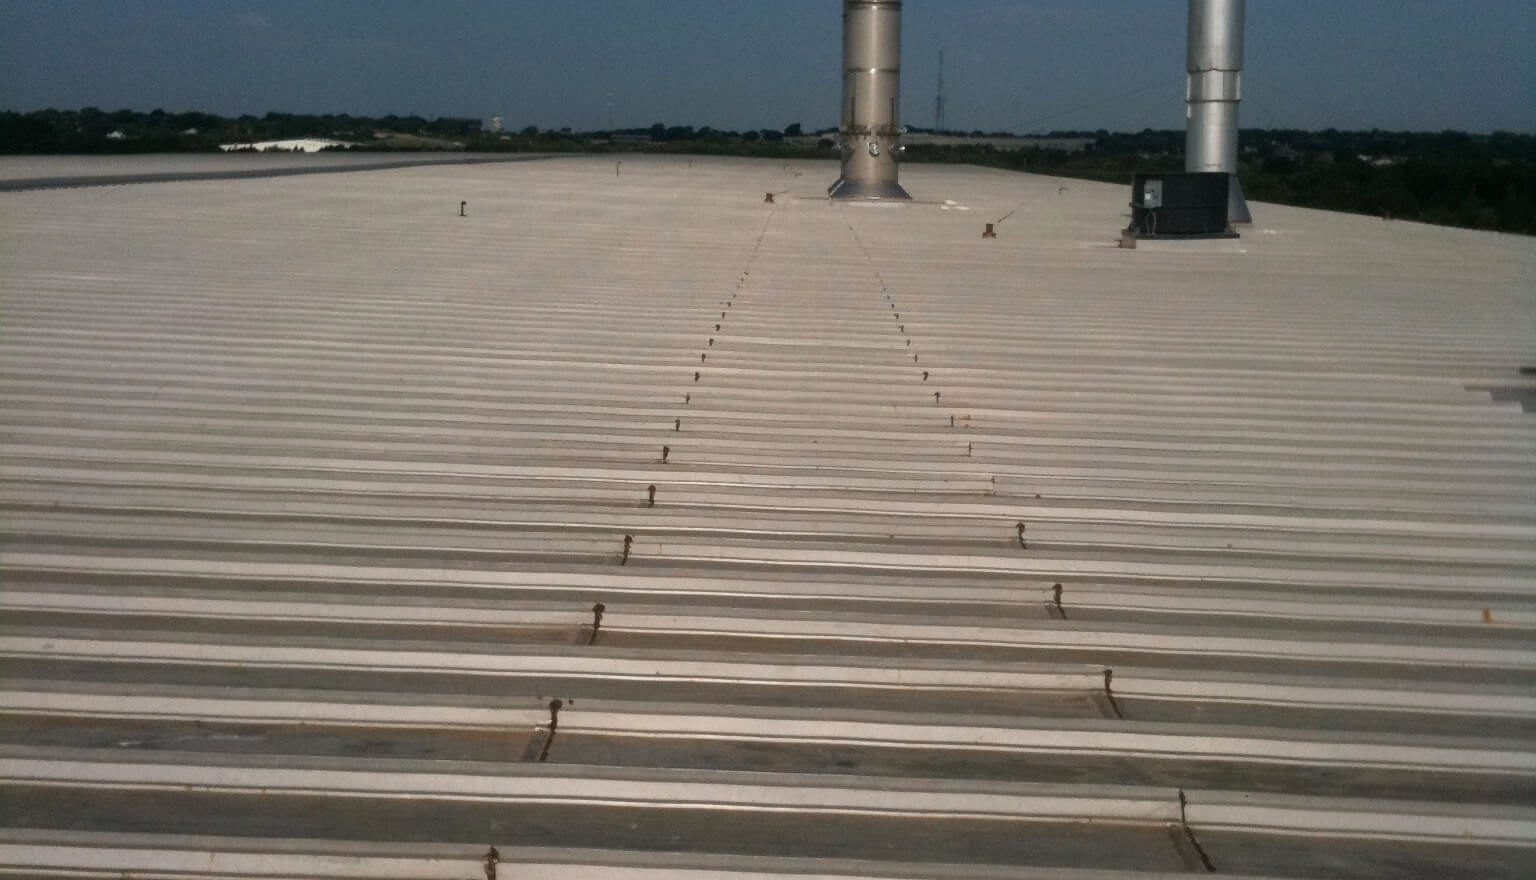 Denton Metal Roofing